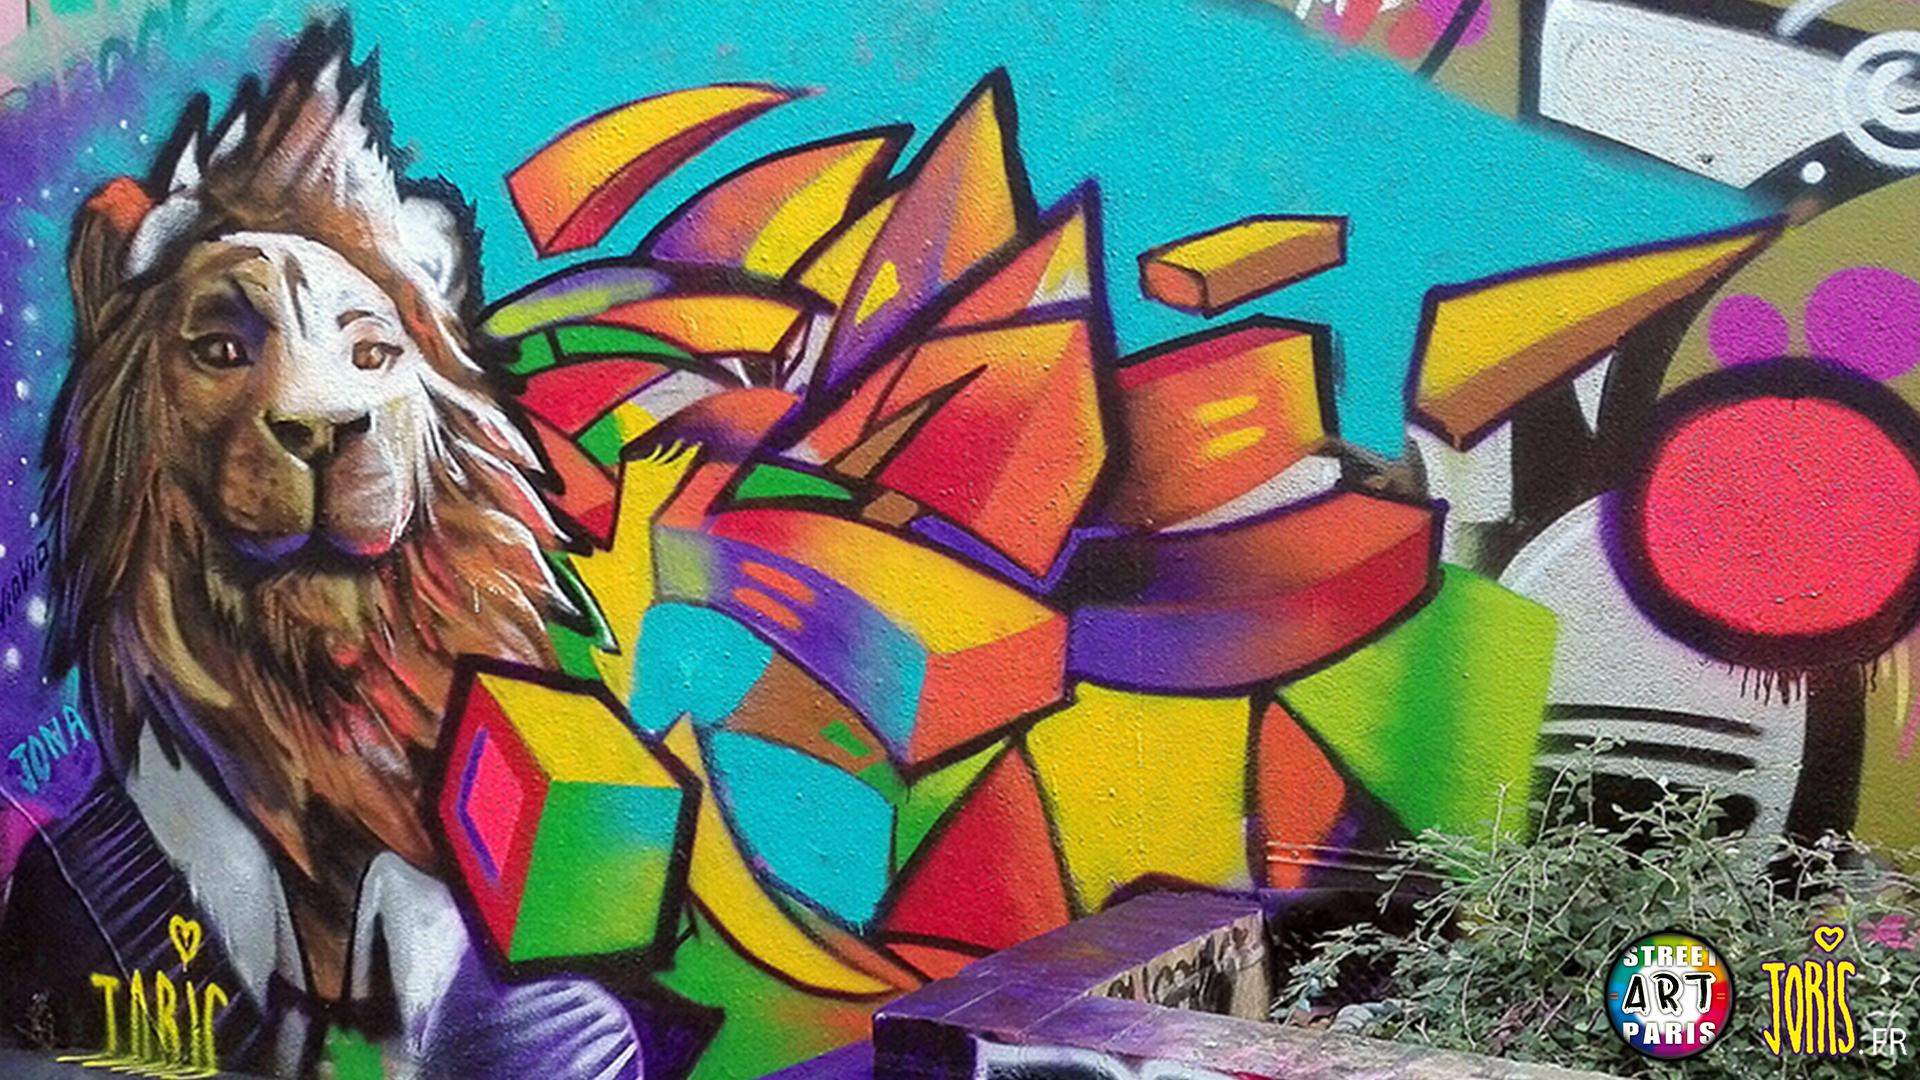 DECORATION-GRAFFITI-FRESQUE-TABLEAU-STREET-ART-PARIS-25